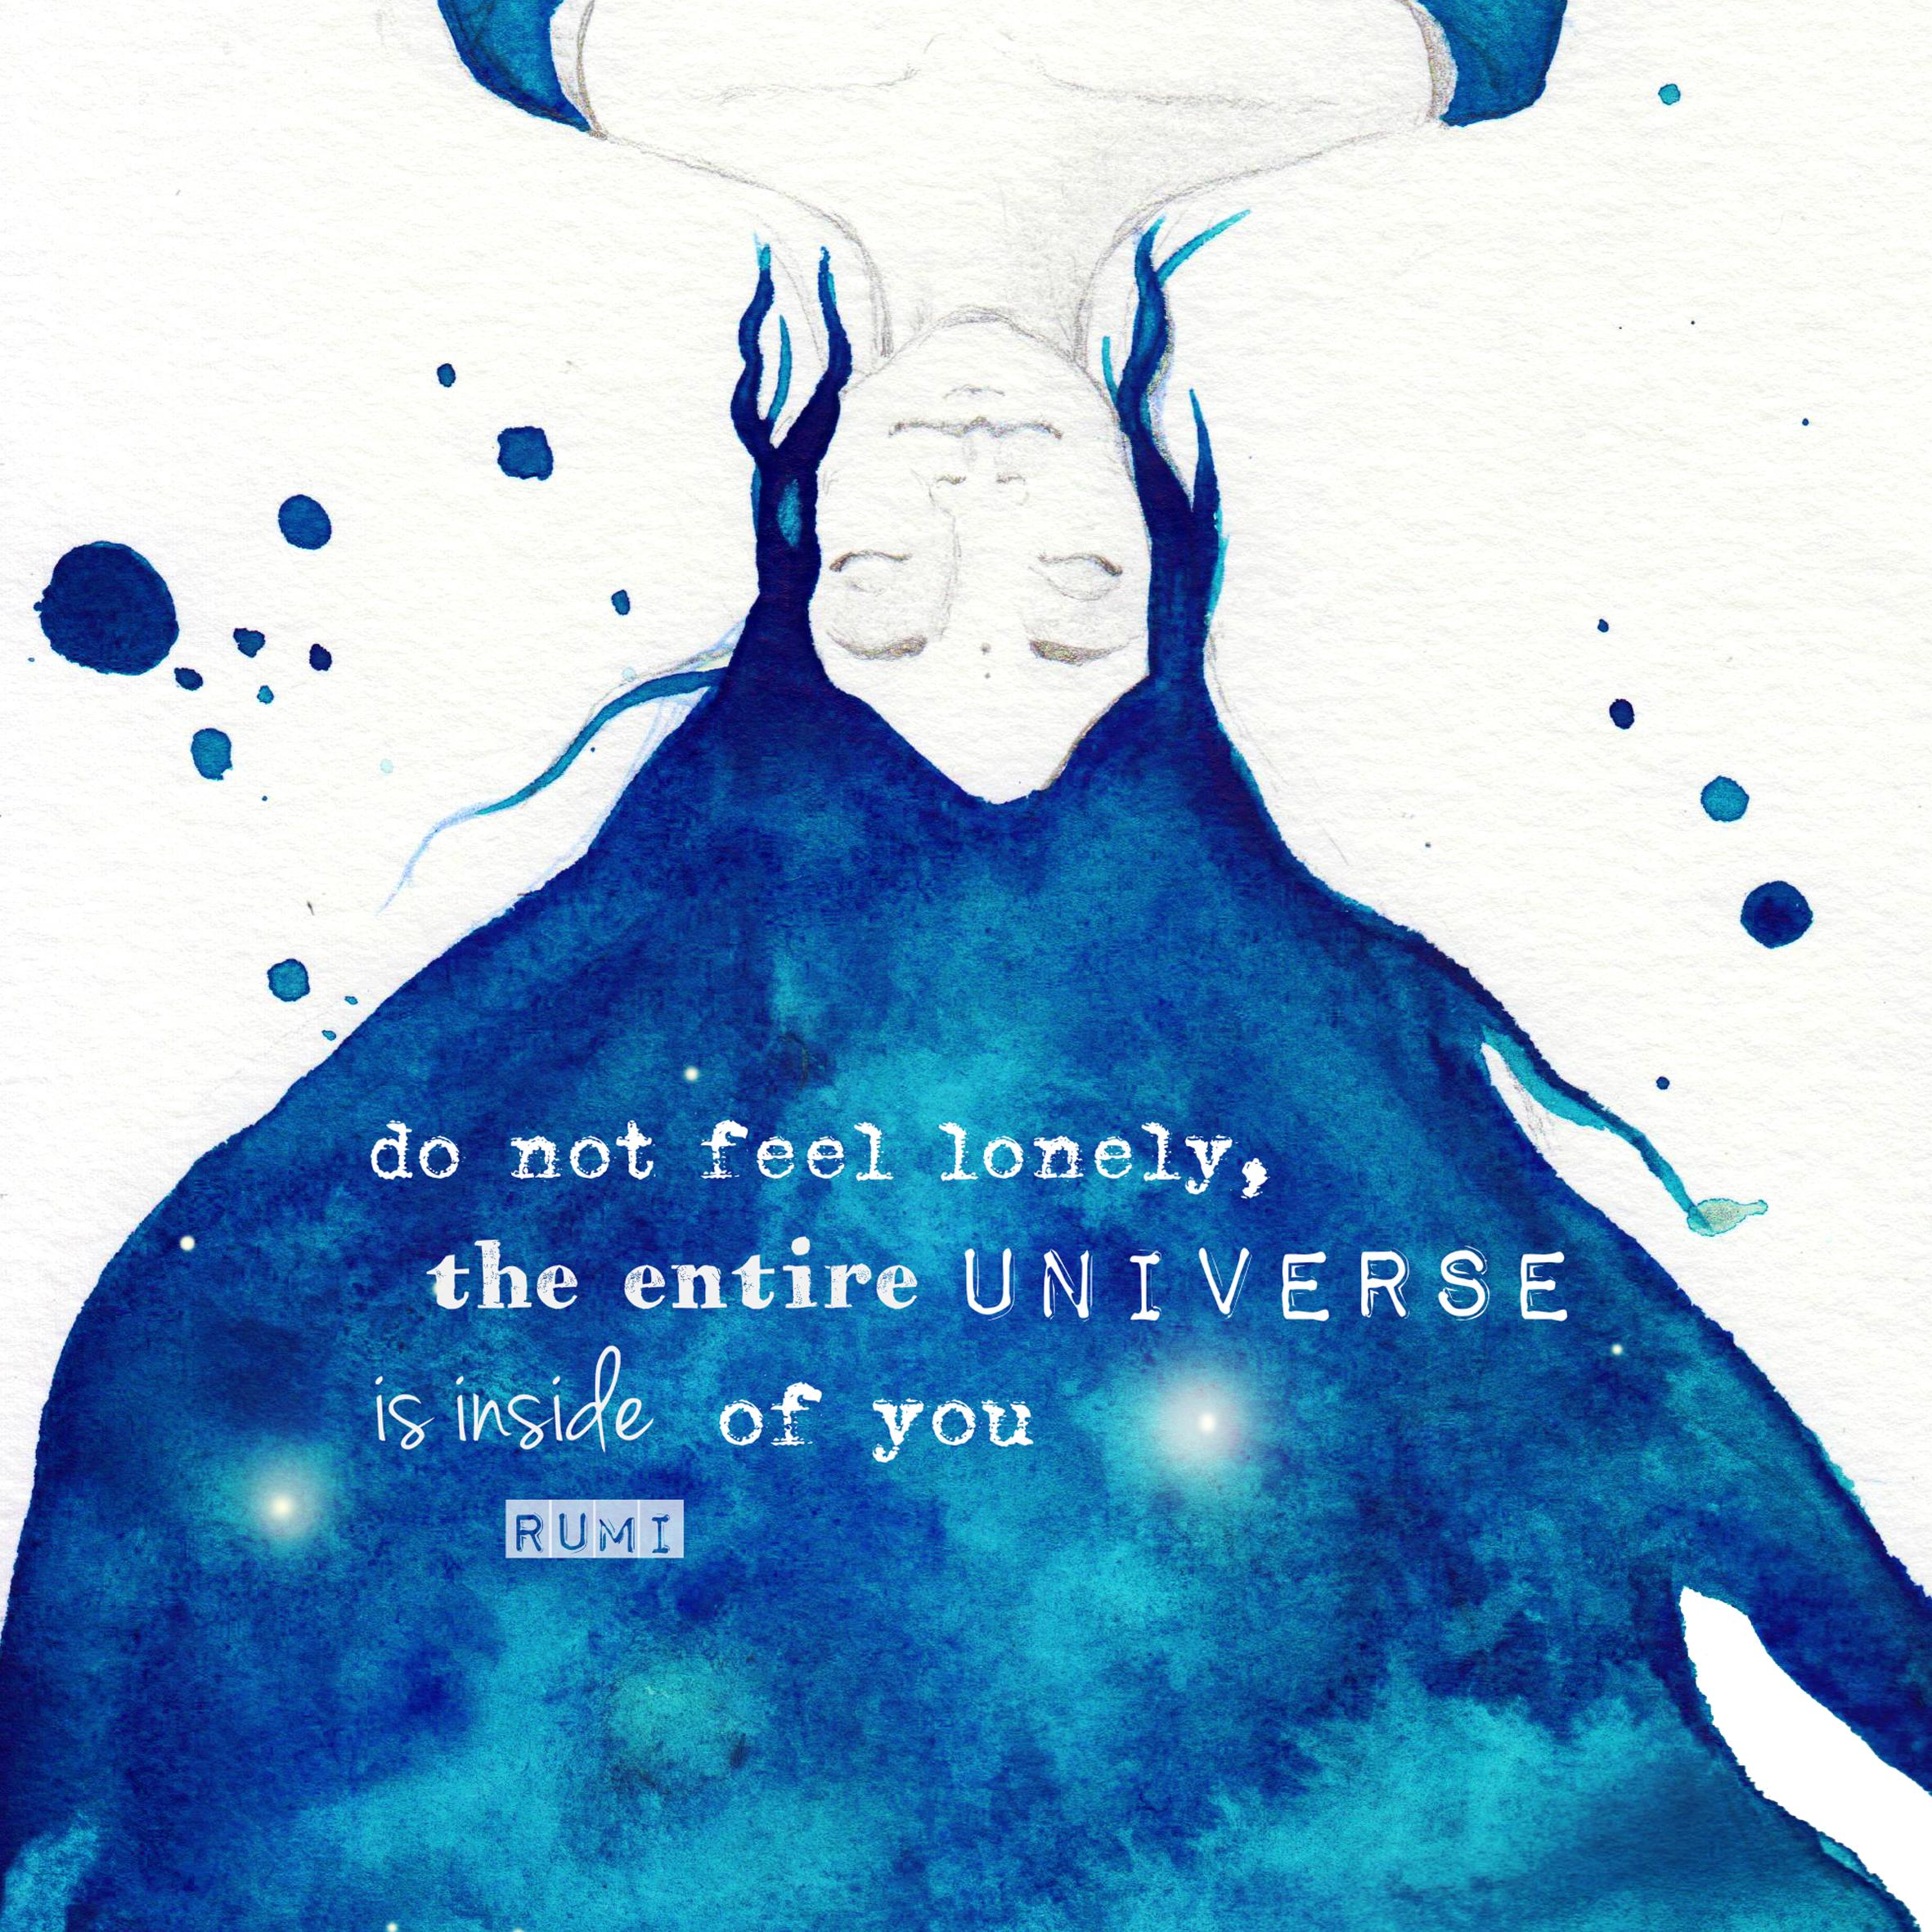 rumi_universe